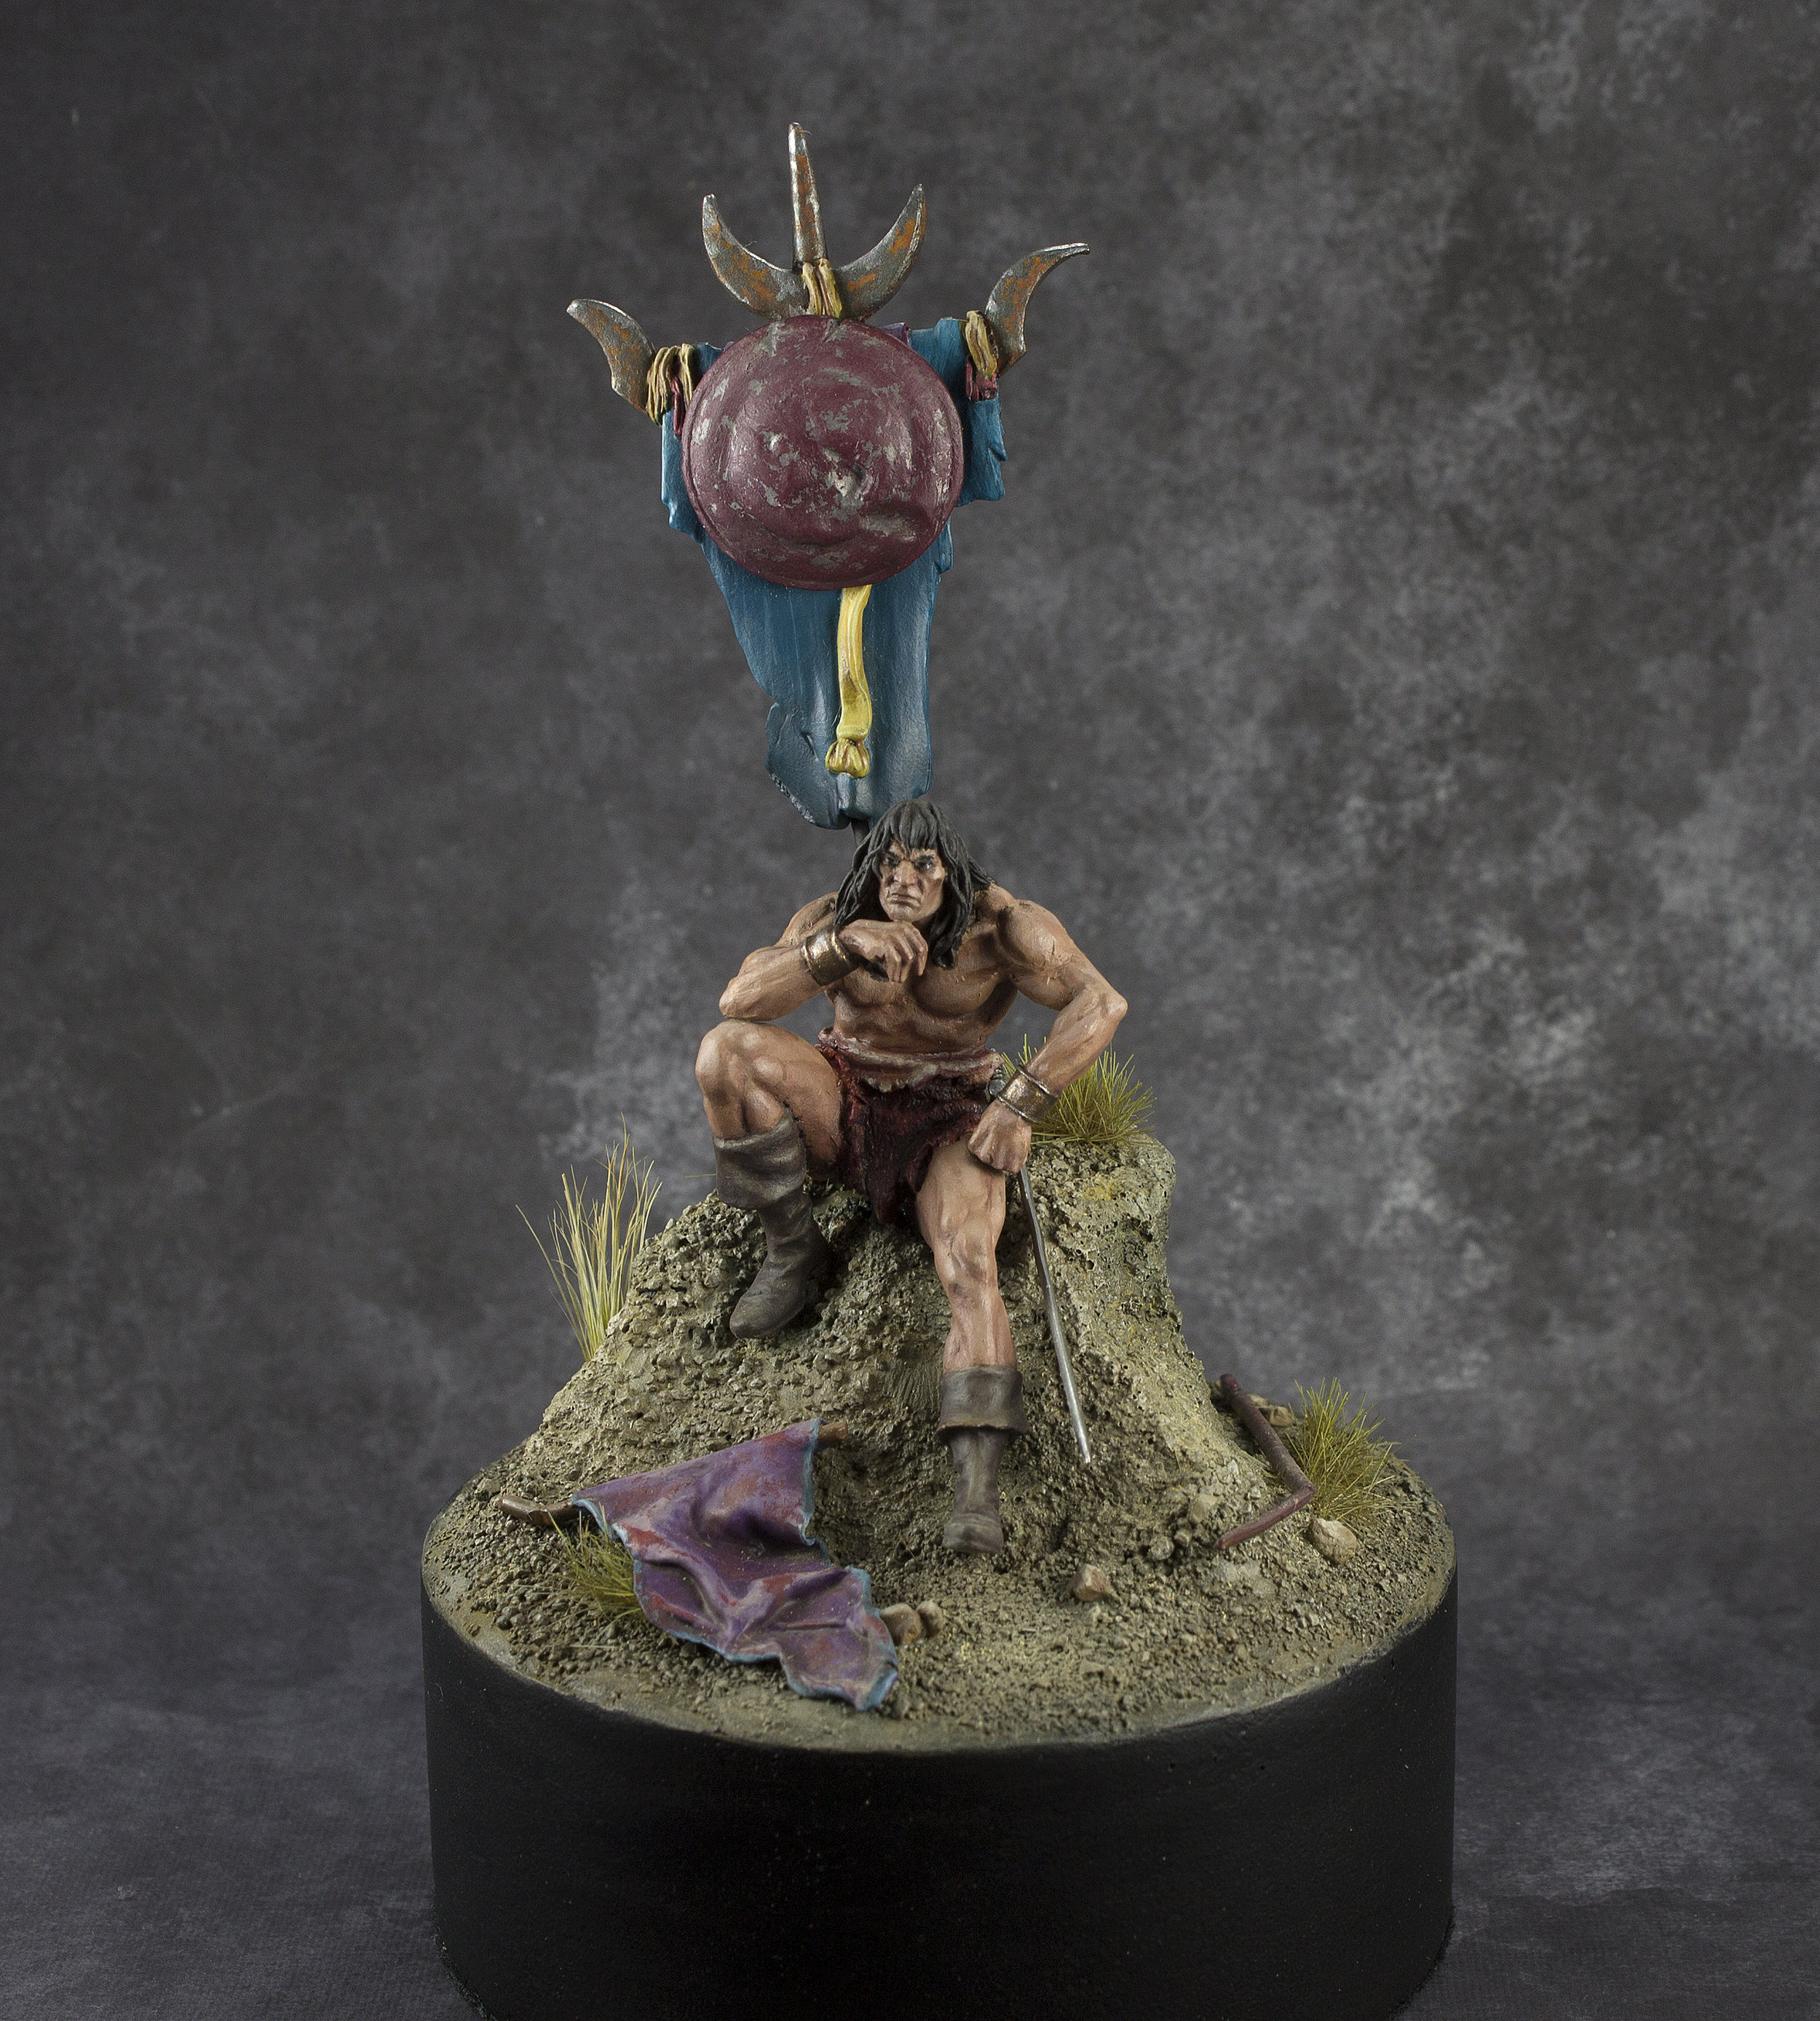 The Cimmeran King